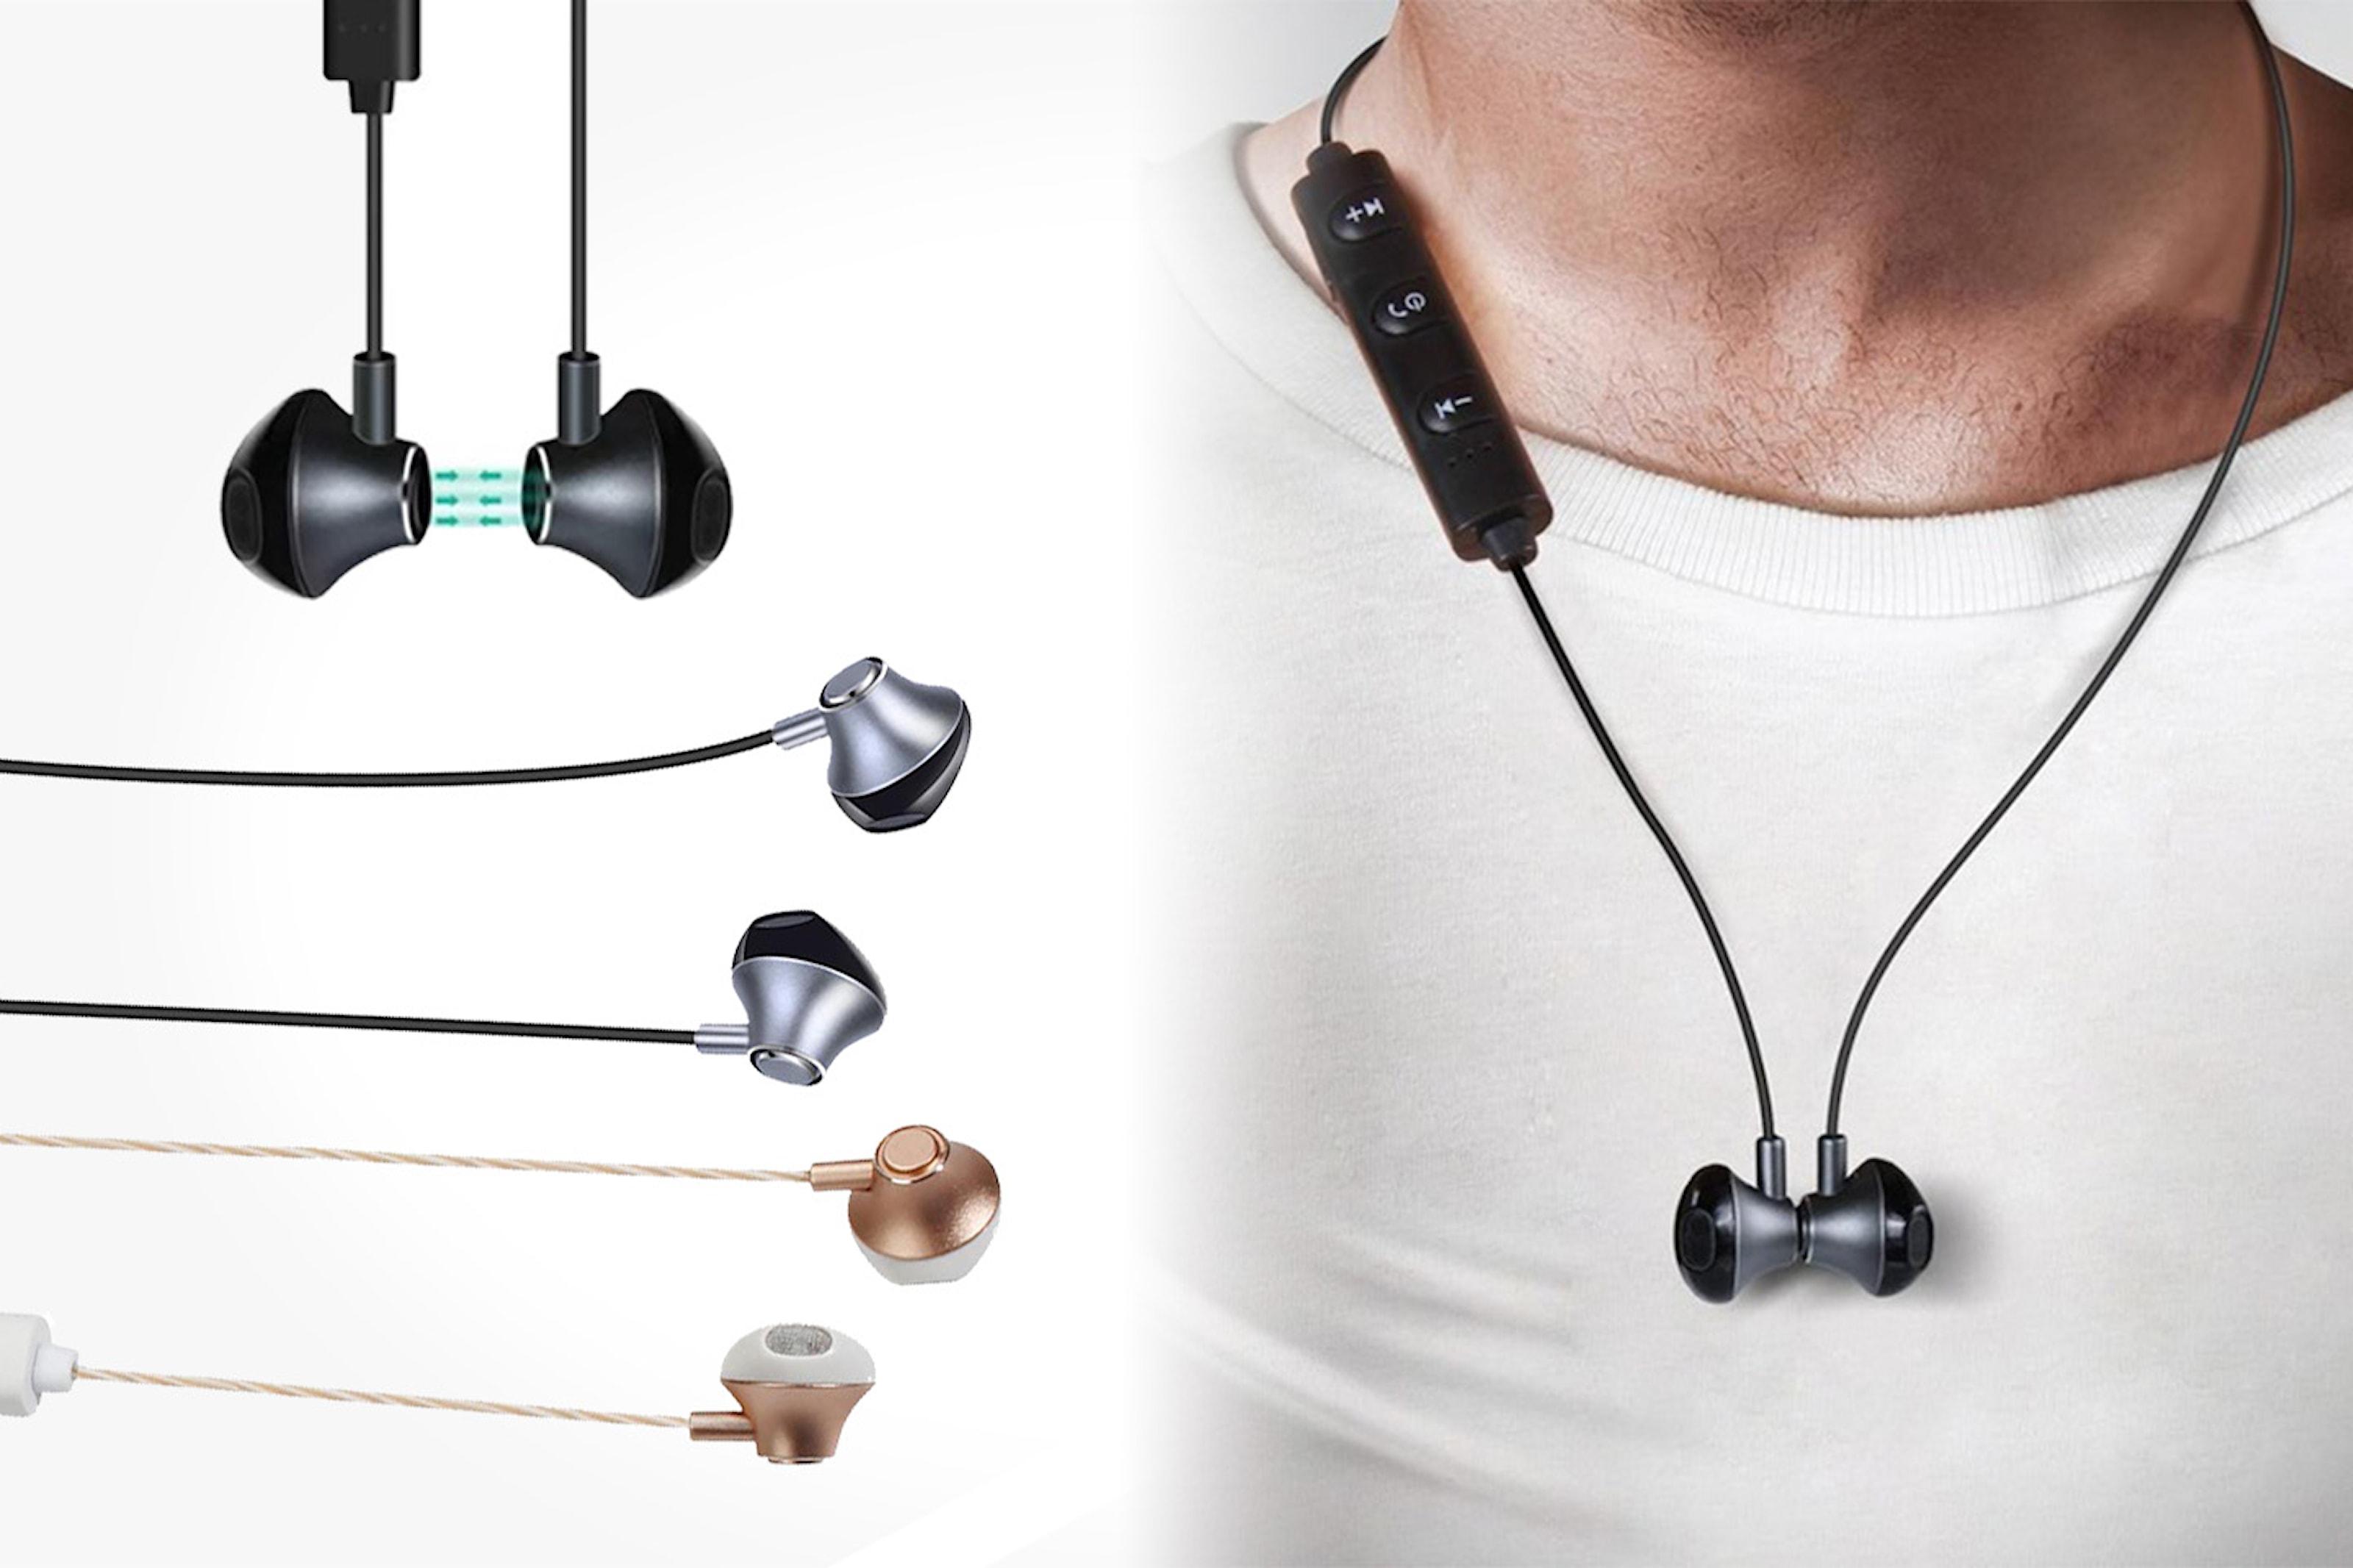 Trådlösa Bluetooth-hörlurar